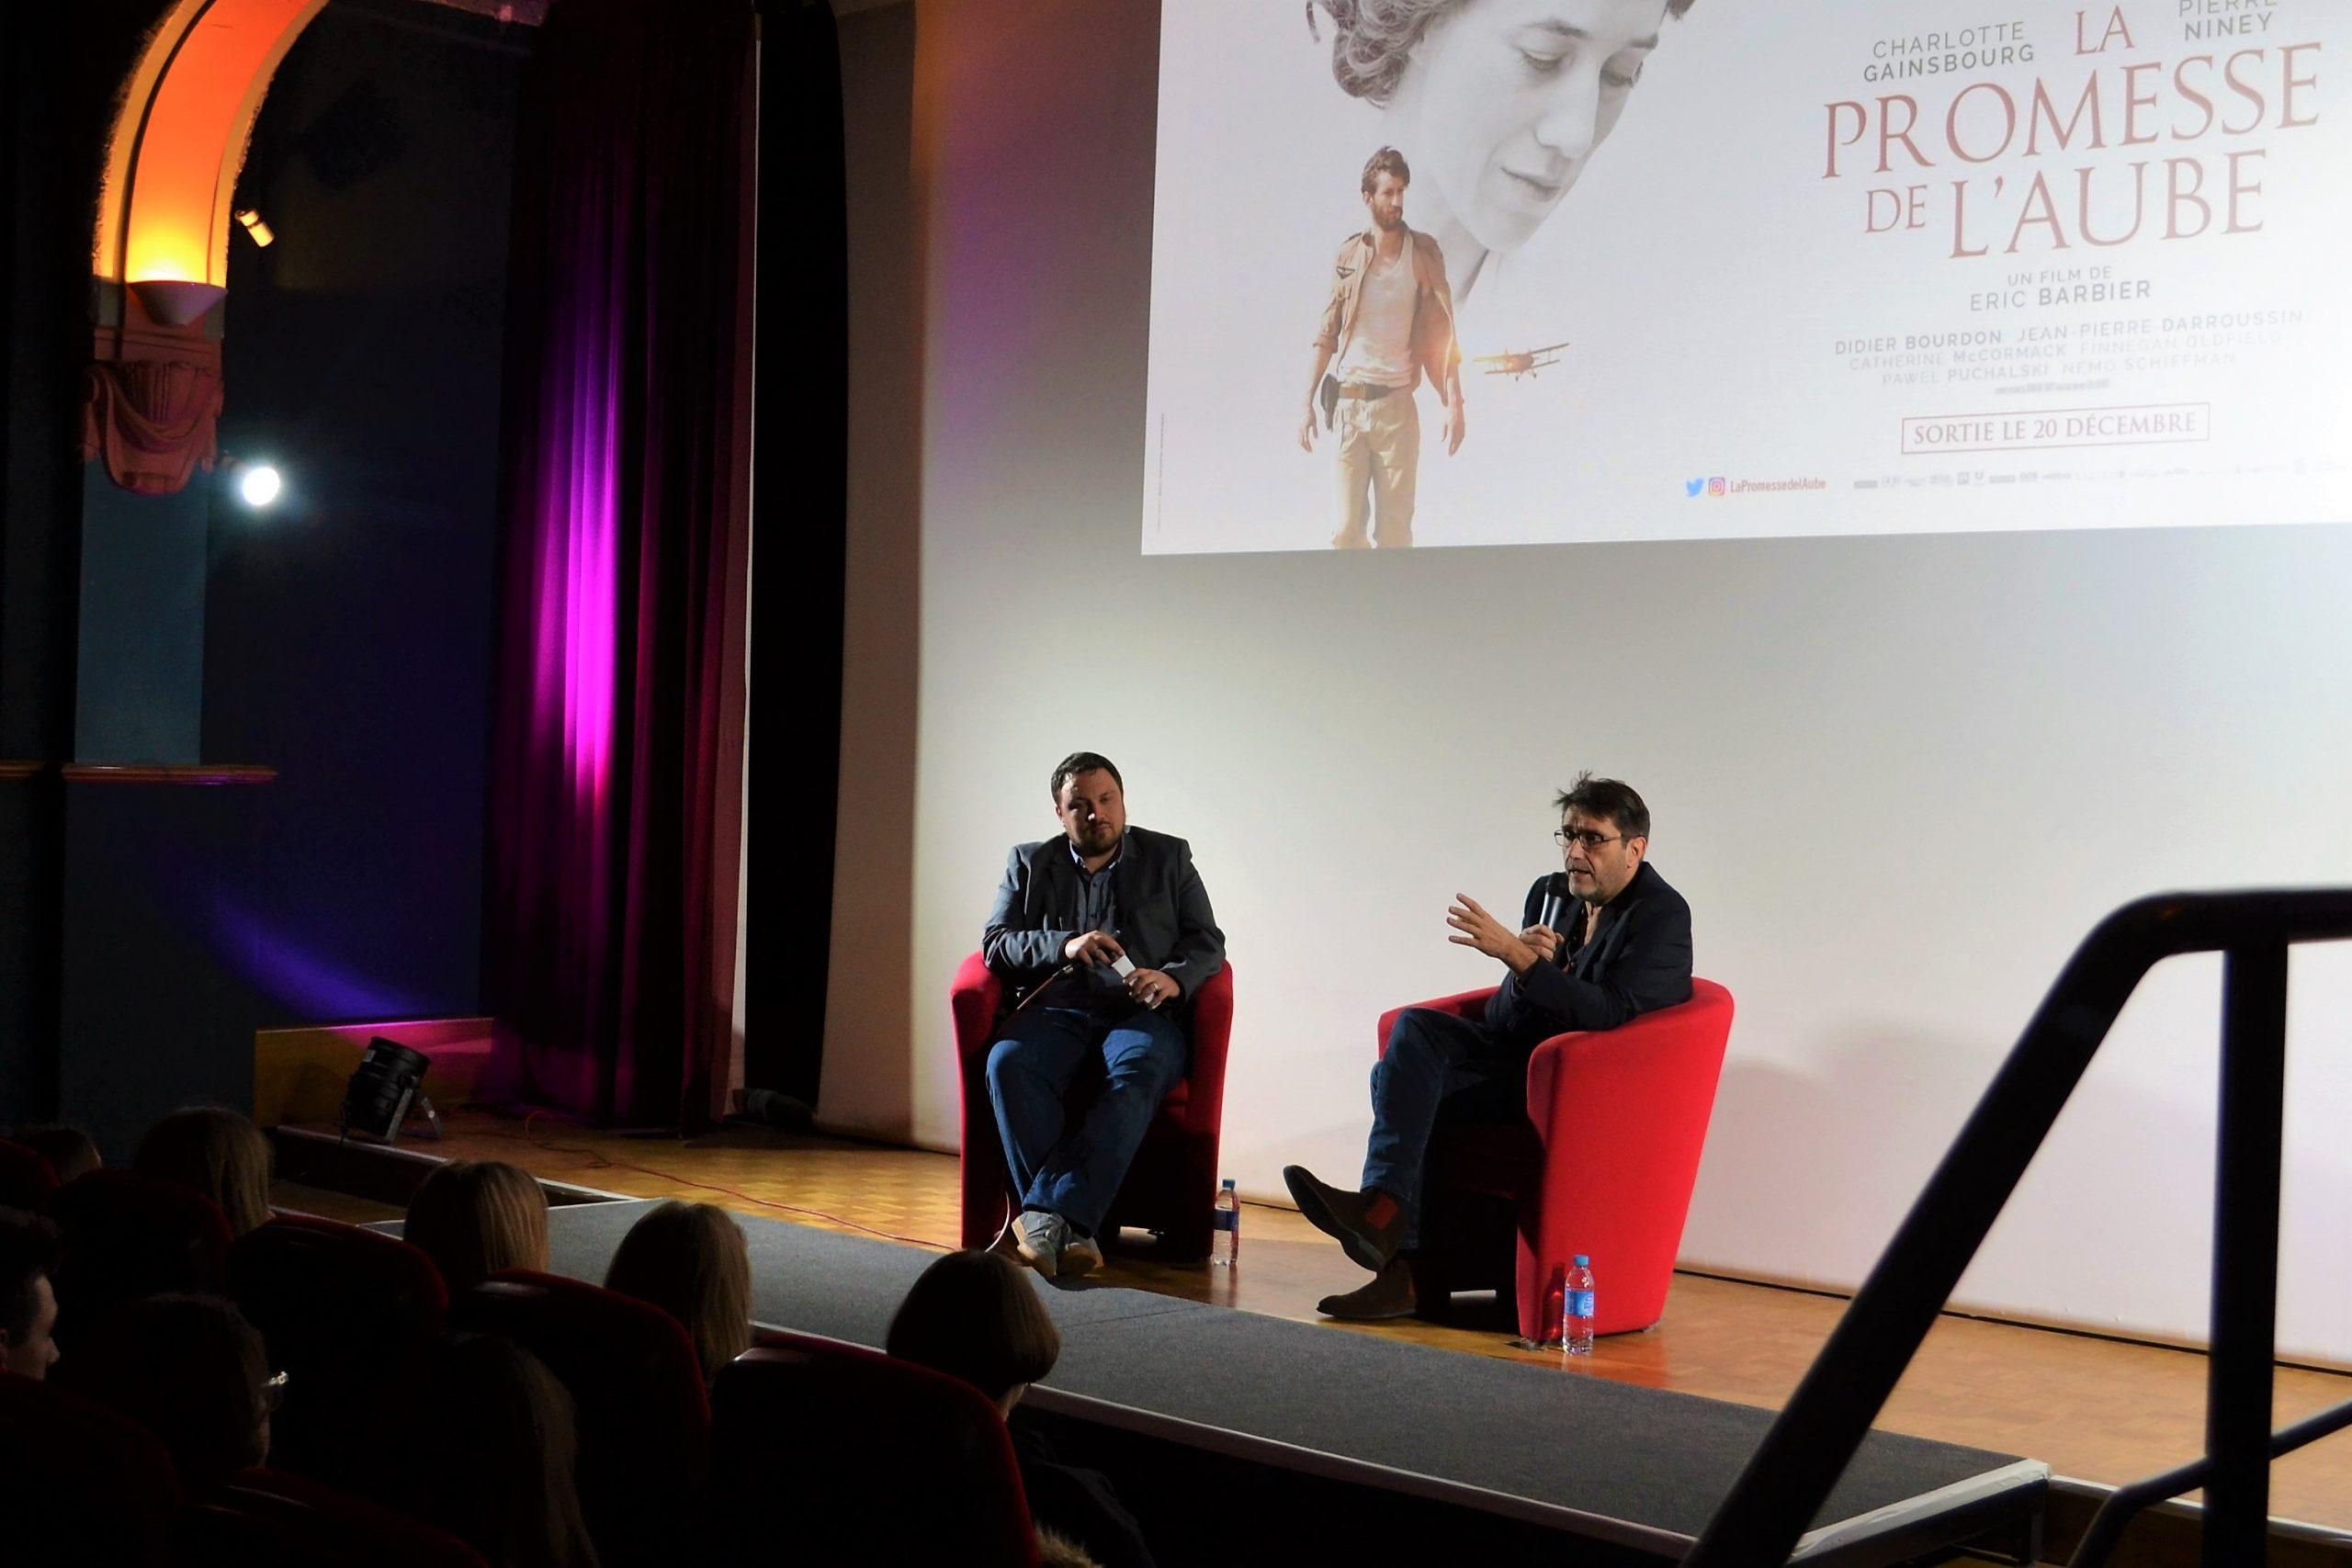 La promesse de l'aube : Eric Barbier raconte l'adaptation de la folle vie de Romain Gary